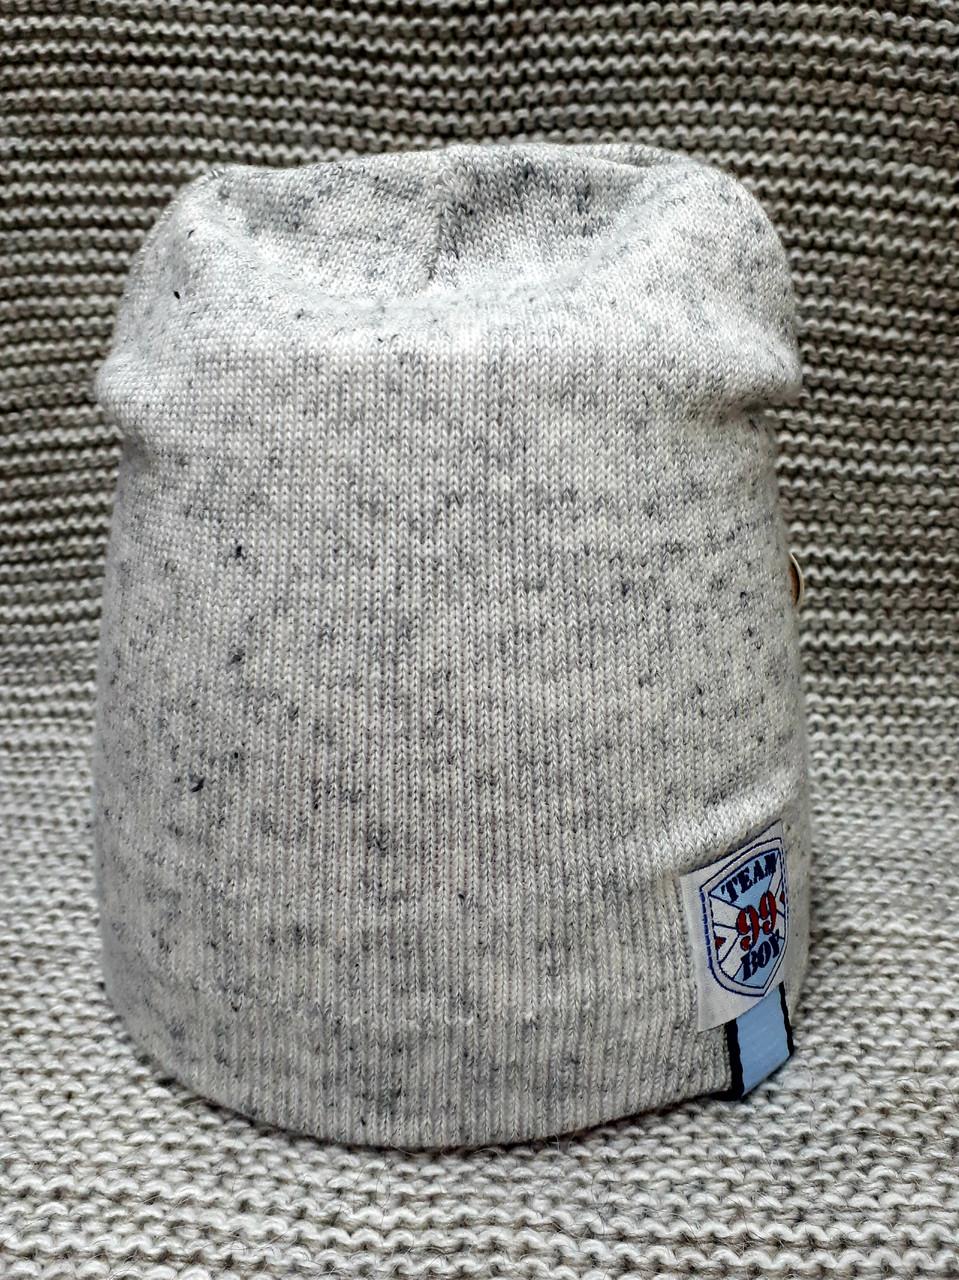 Шапка на мальчика весна-осень серый меланж ANPA (Польша) размер 46 48 50